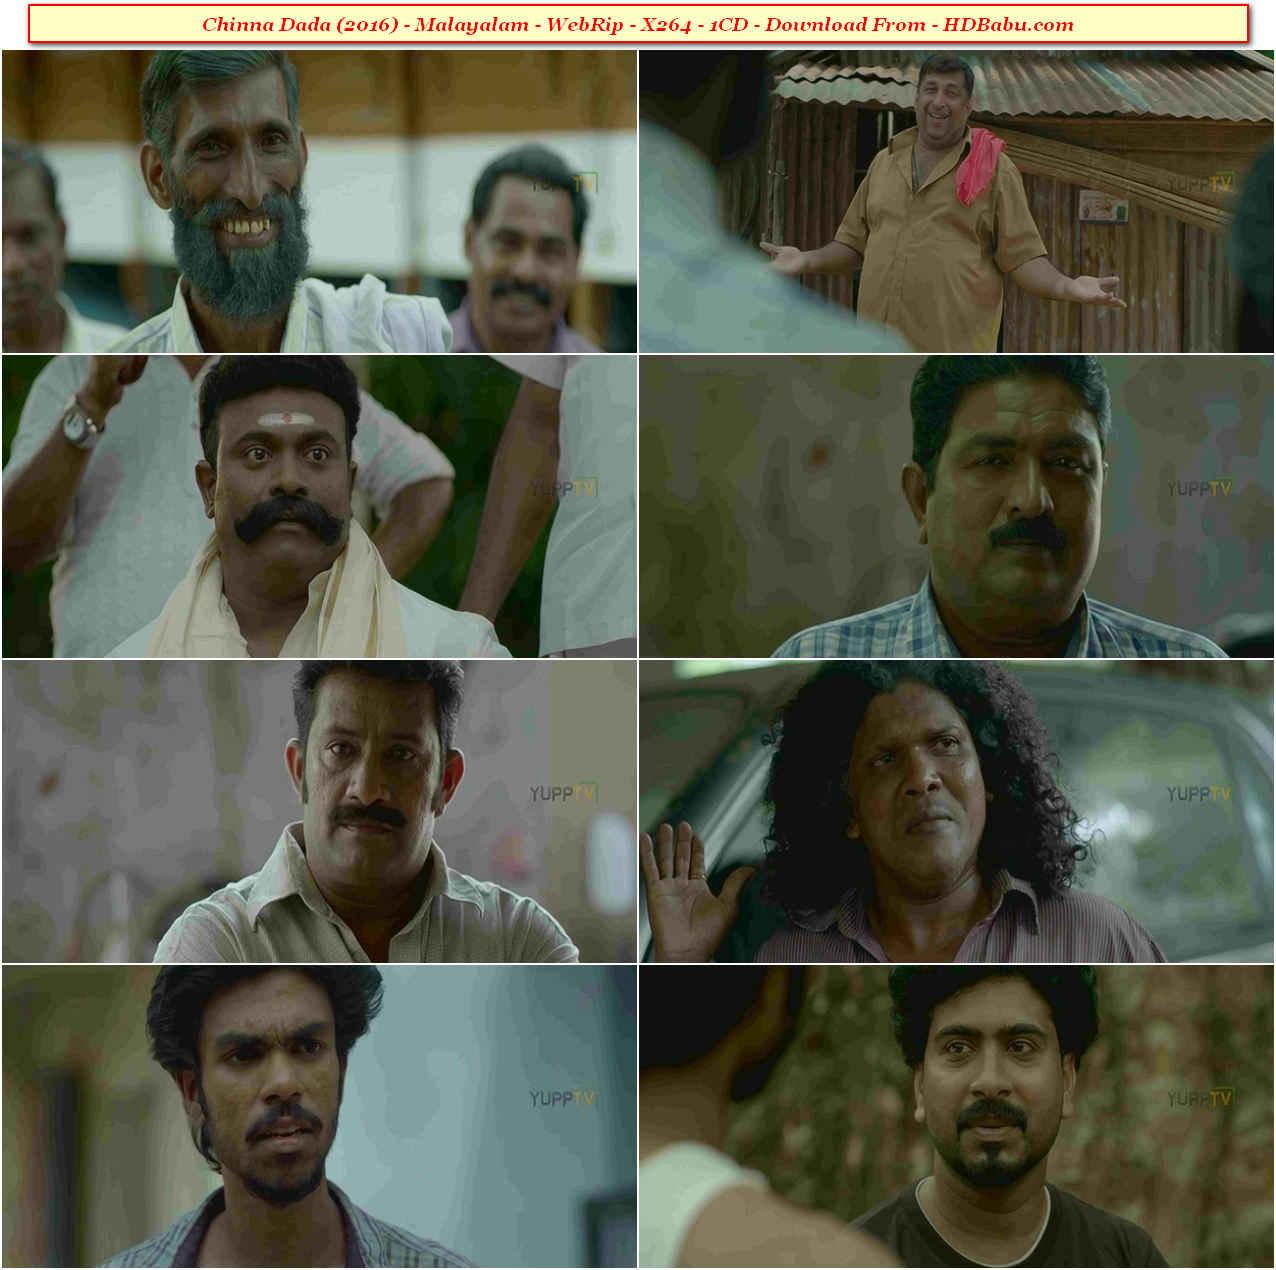 Chinna Dada Full Movie Download